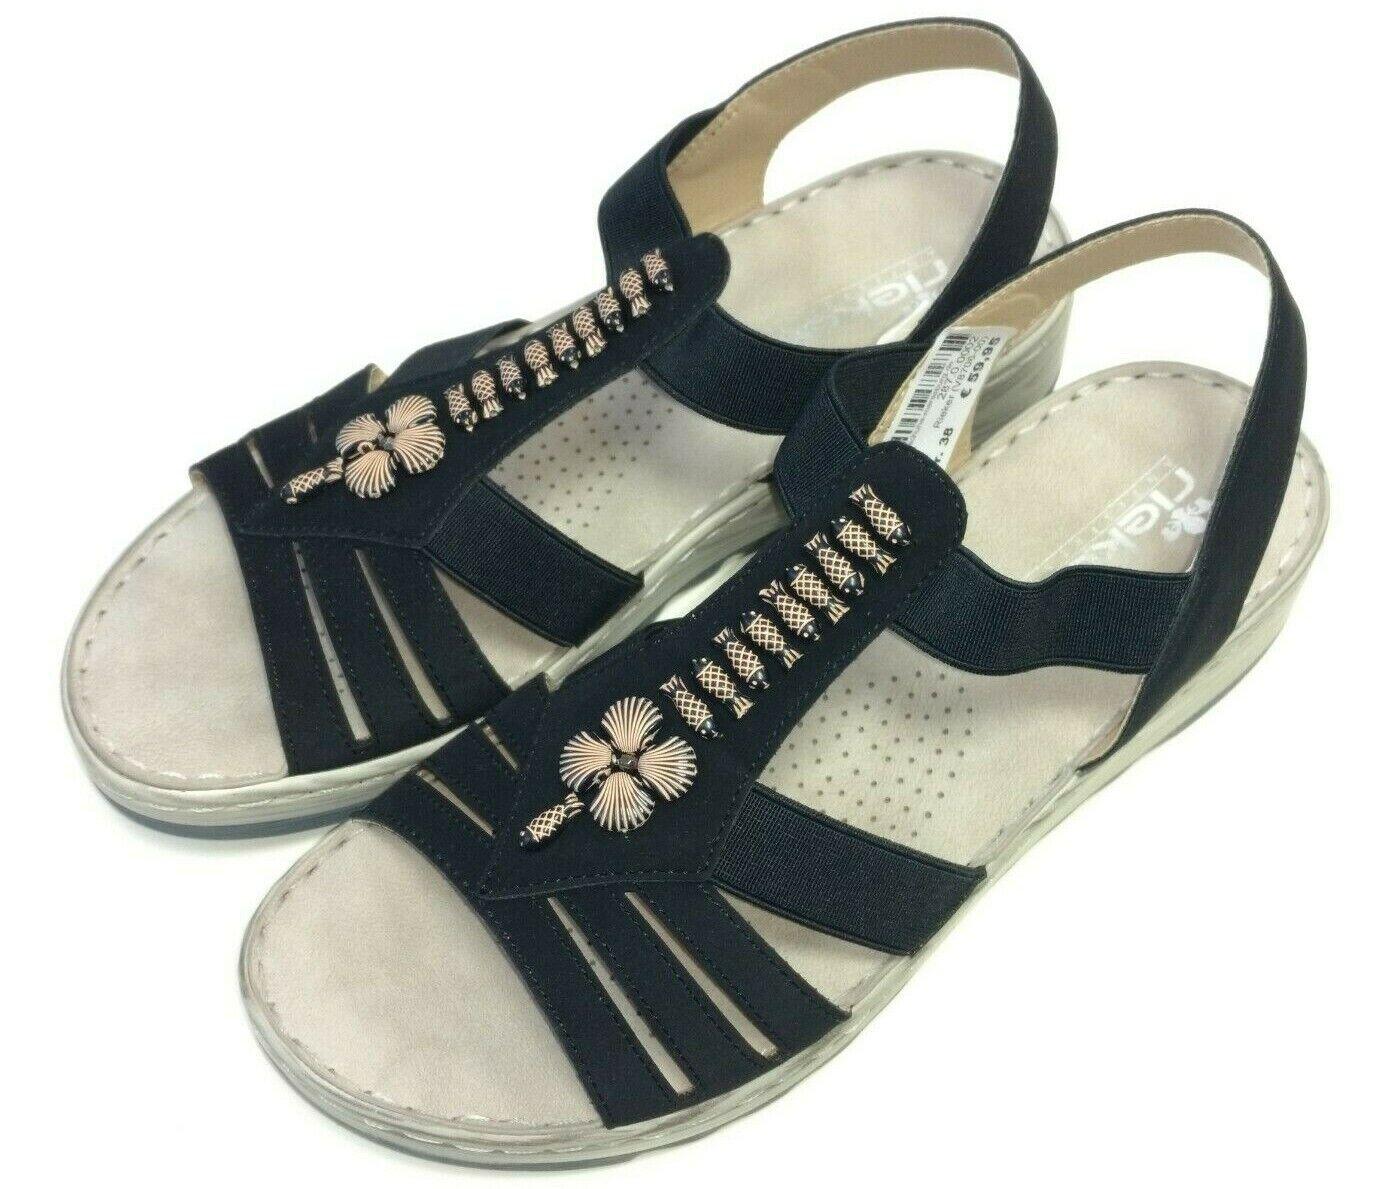 Rieker Antistress Damen Schuhe Sandale Sandalette Pantolette V8706-00 schwarz  | Trendy